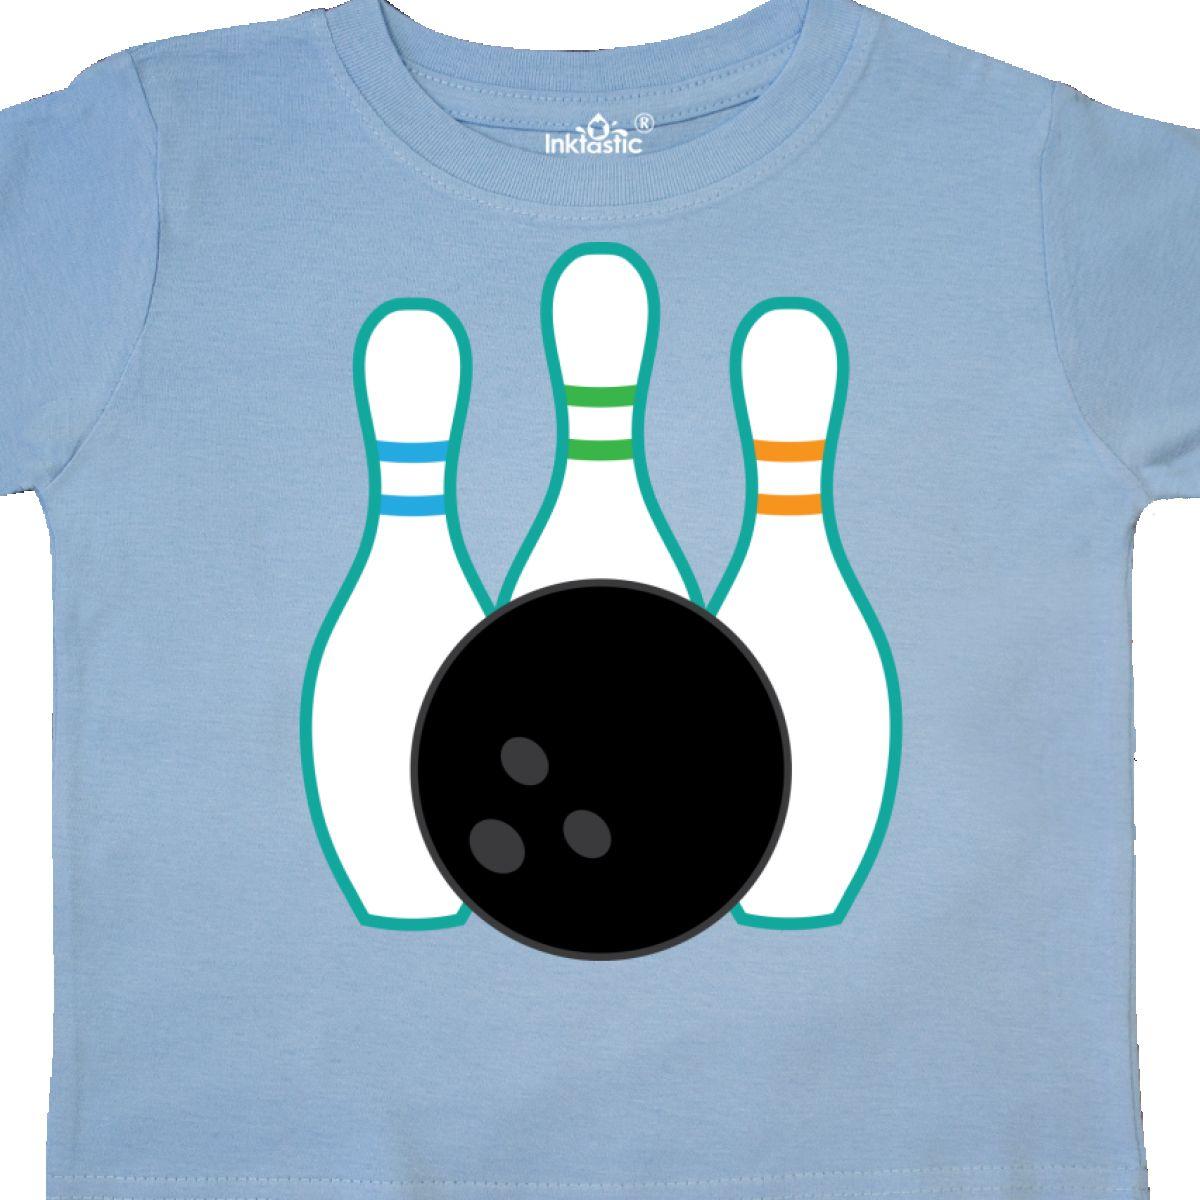 Inktastic Bowling Team Bowler Gift Toddler T-Shirt Pins Ball Bowl Sports Hobbies